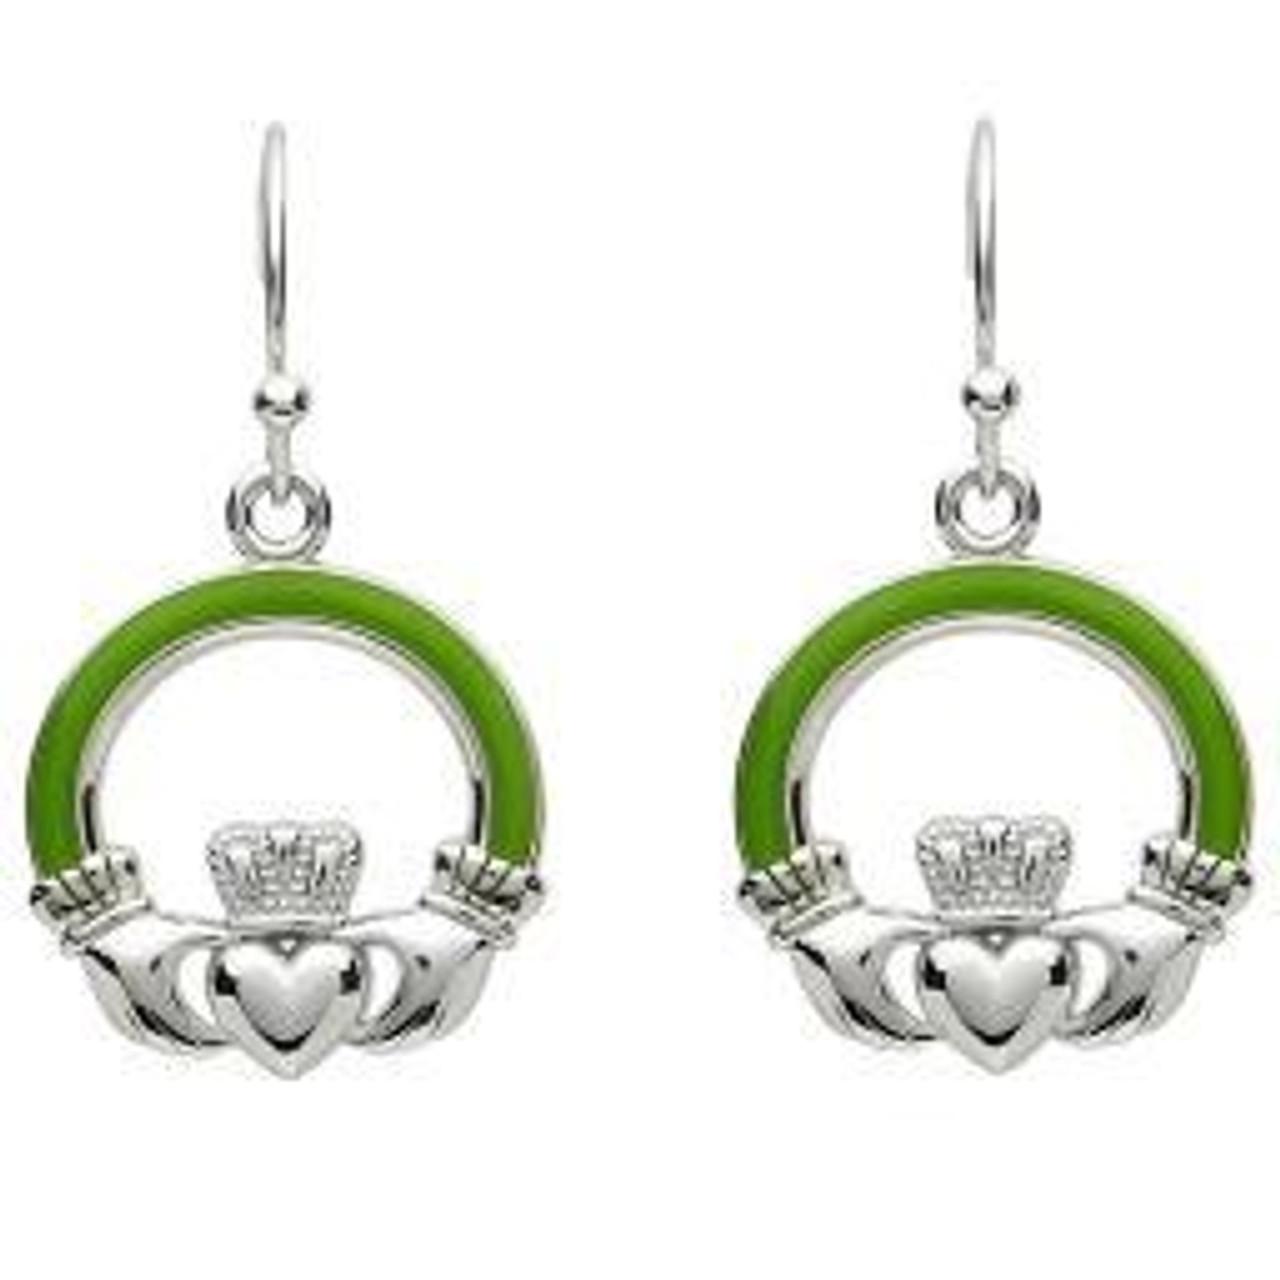 e36059219076b Green Enamel Large Claddagh Earrings